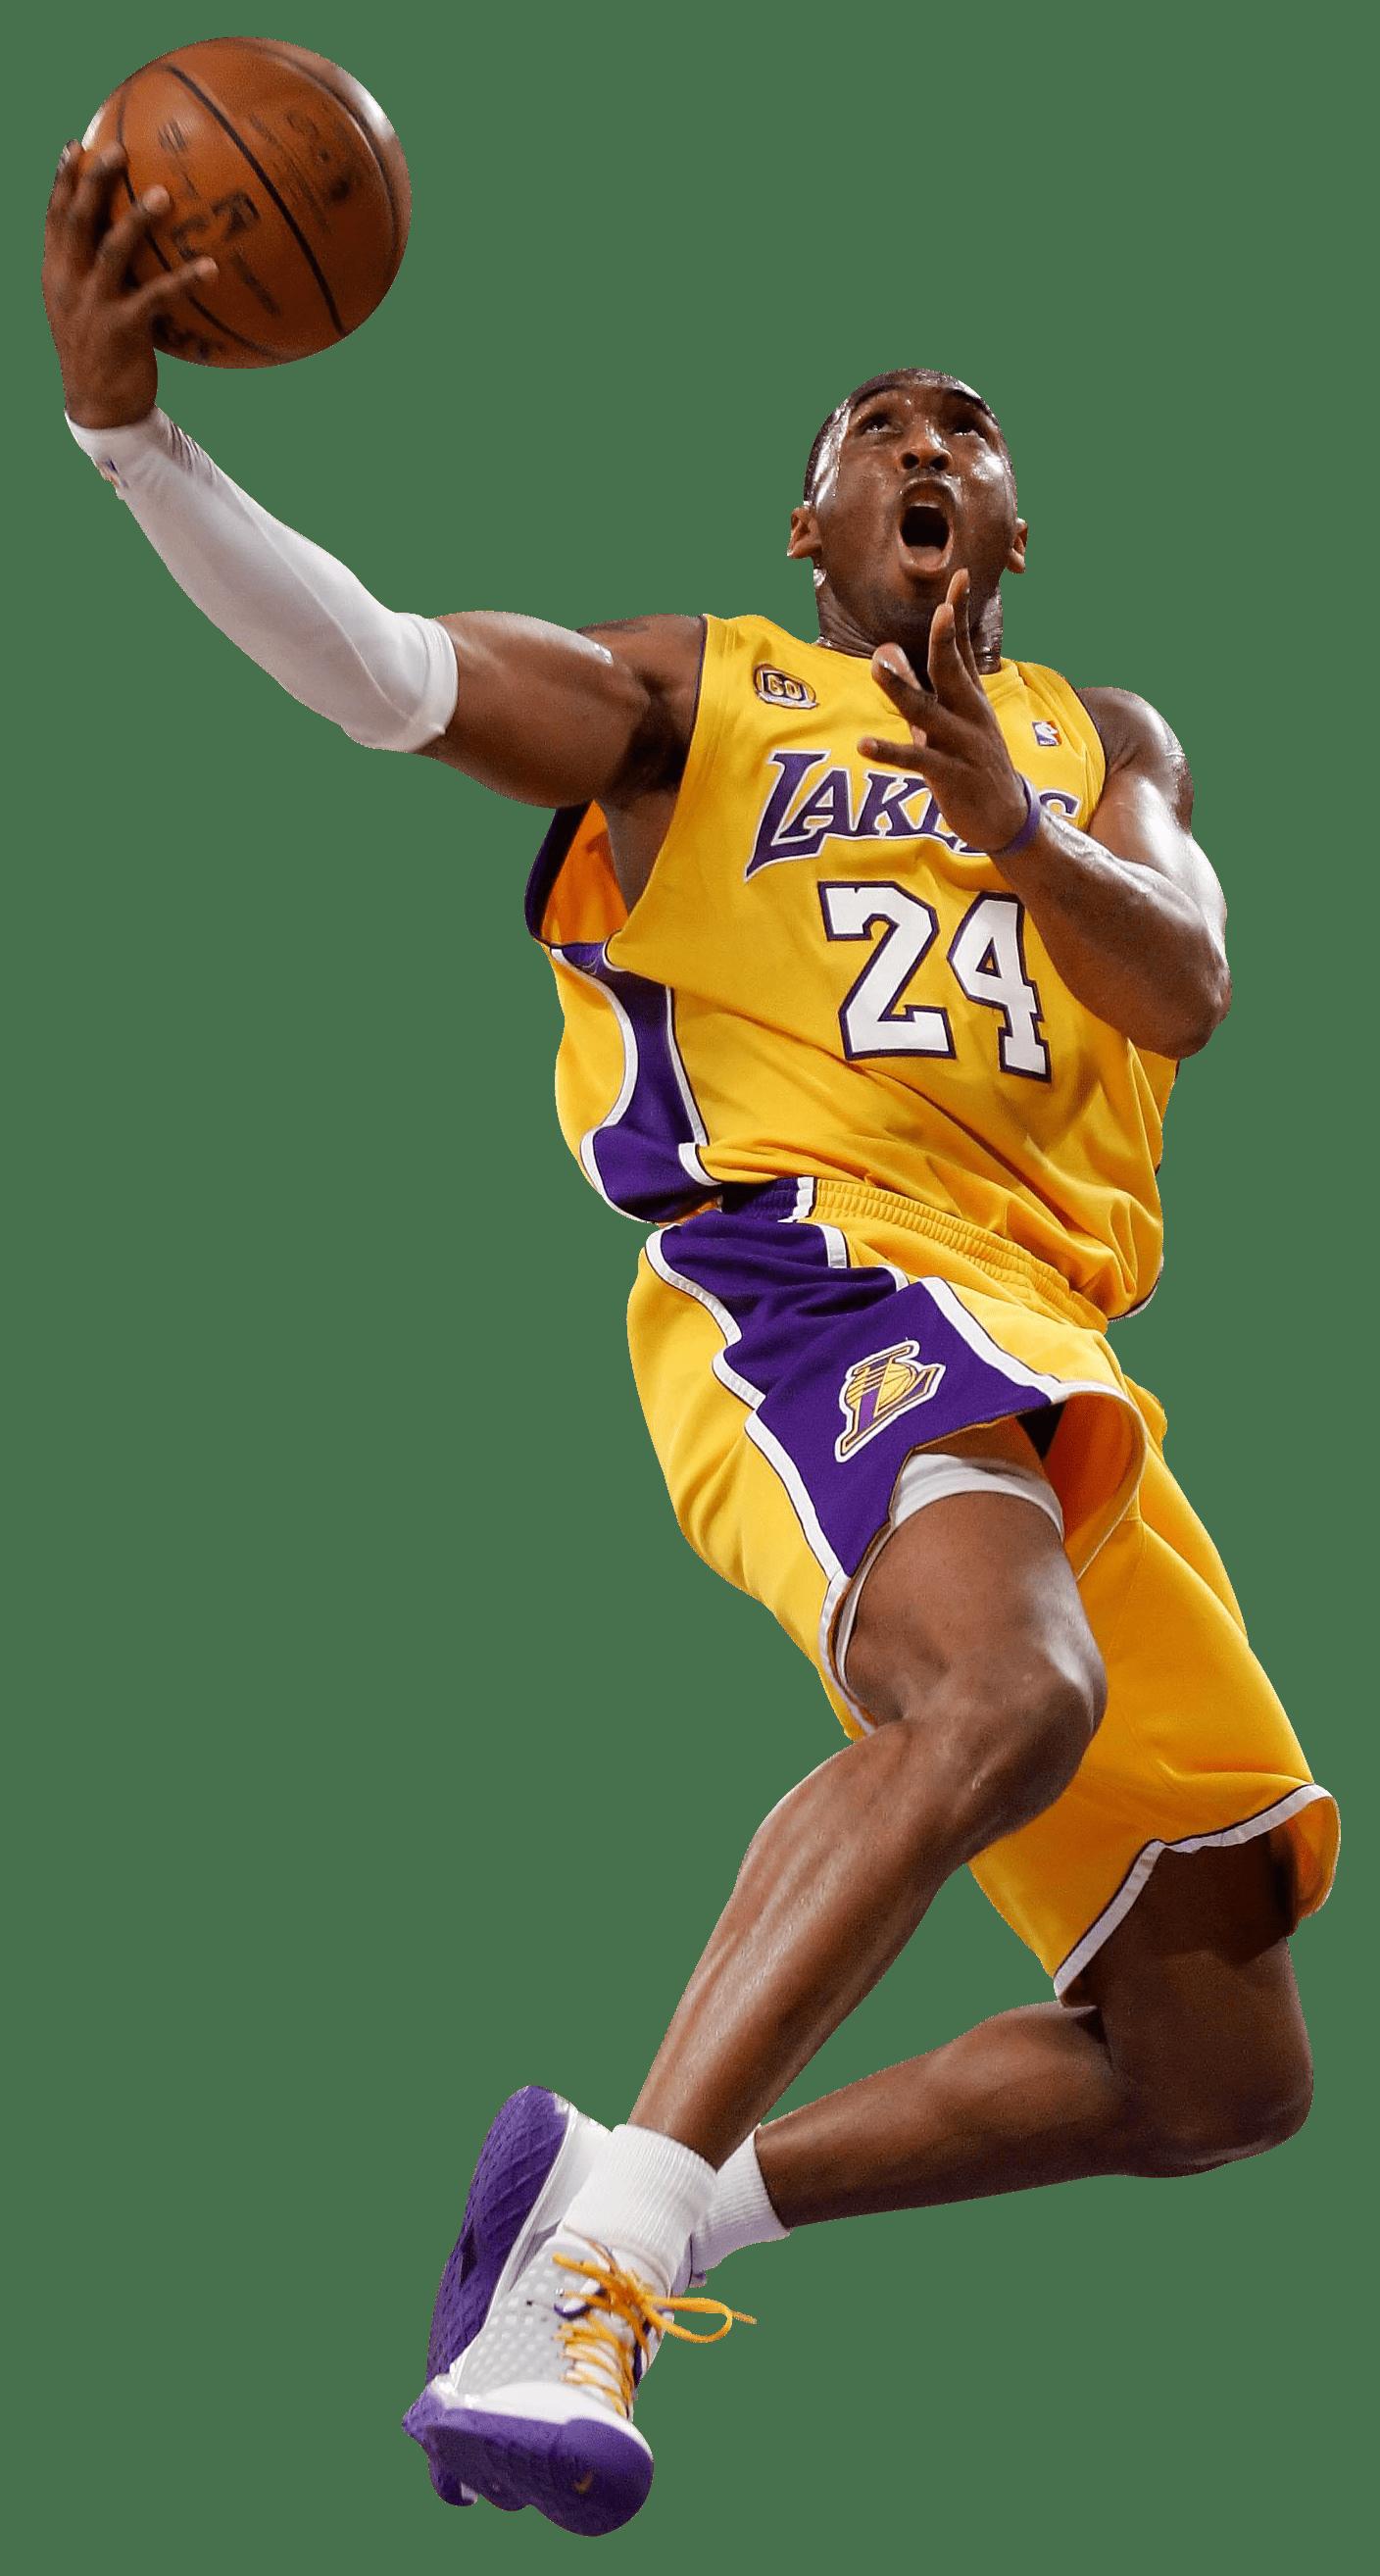 Kobe Bryant Dunk-Kobe Bryant Dunk-12